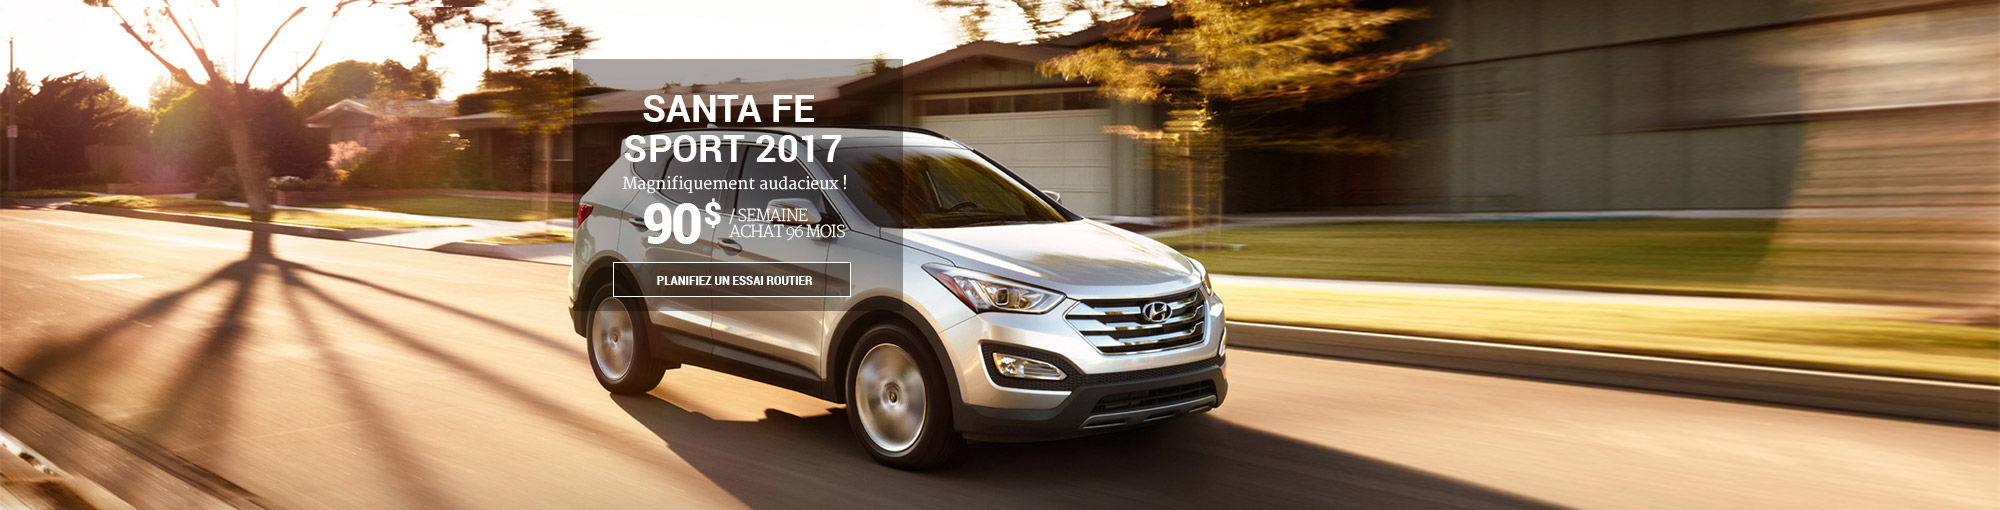 Hyundai Santa Fe Sport 2016 - header - juillet 2016 HSH